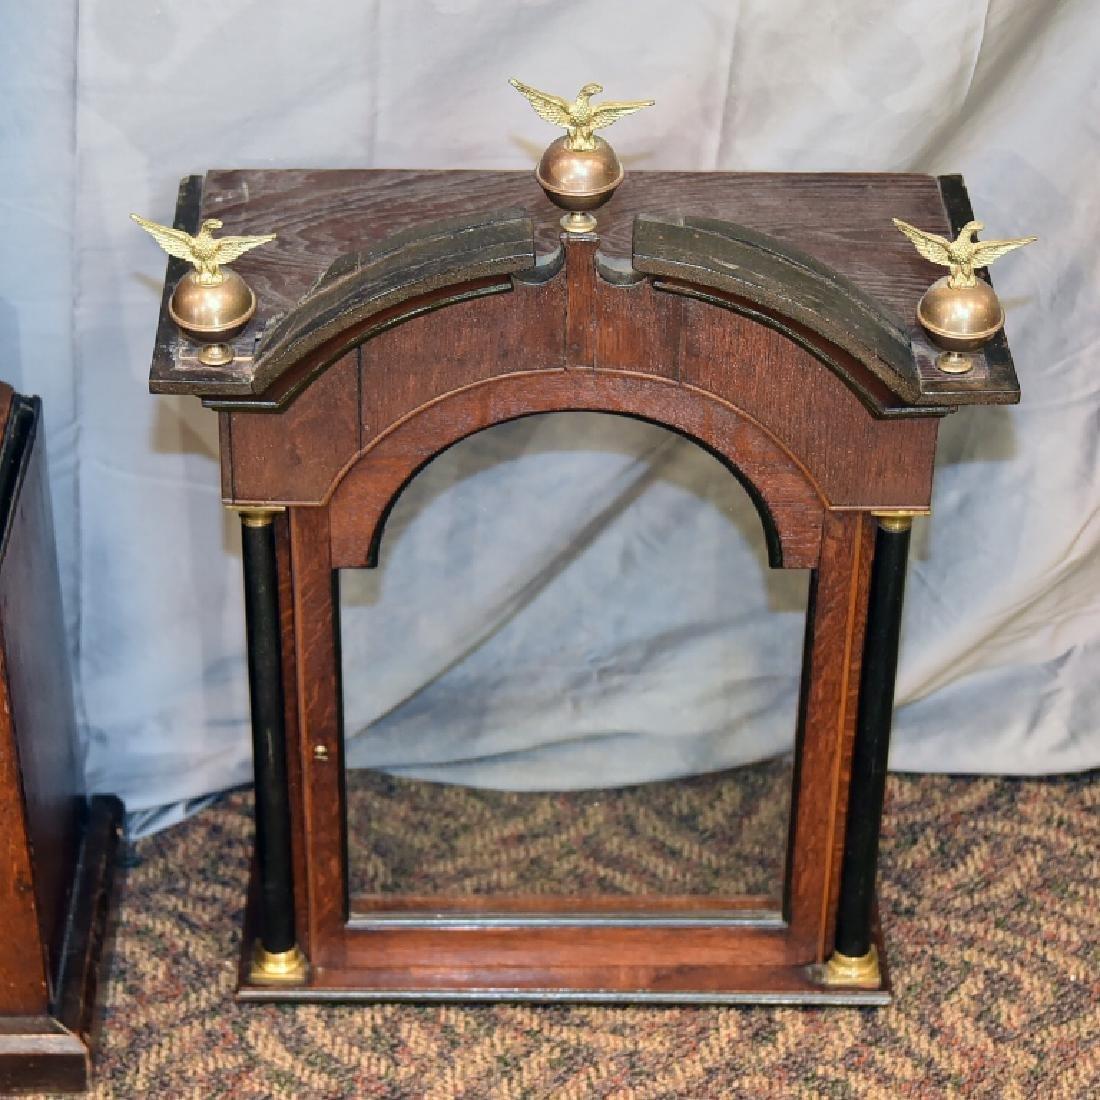 Circa 1780 Scottish Longcase Grandfather Clock - 18